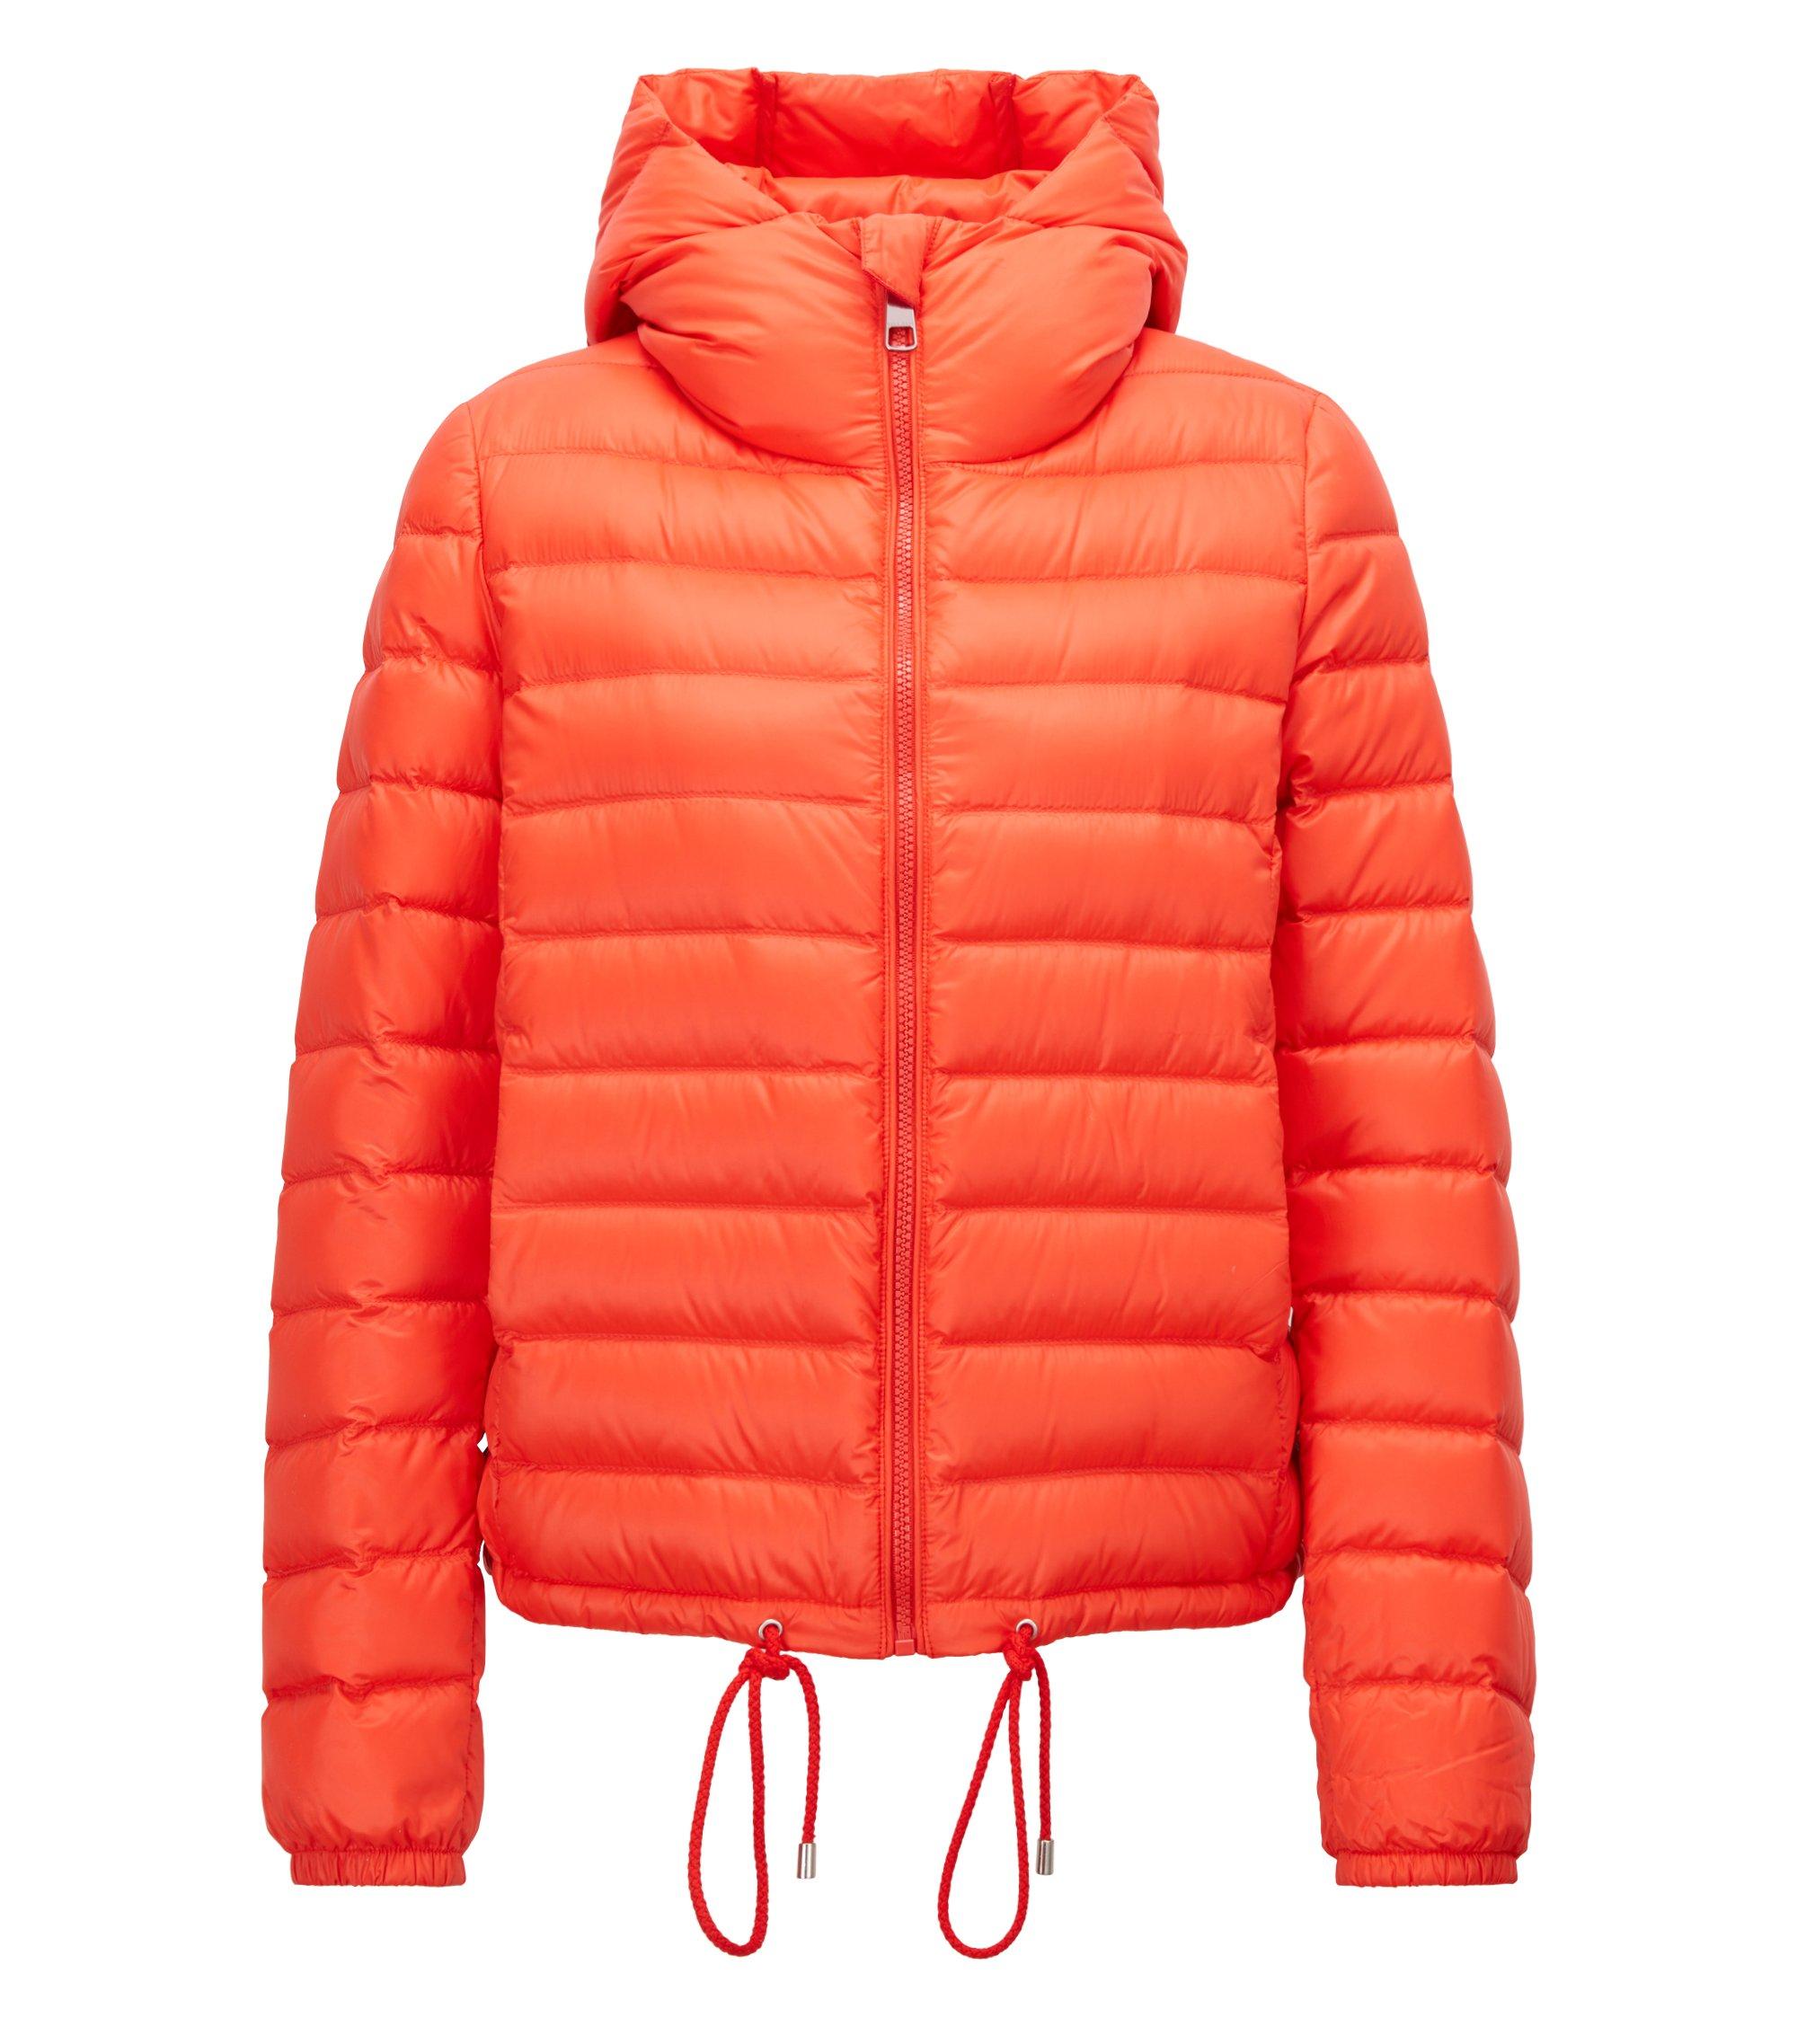 Lichte jas met donsvulling en waterafstotende buitenkant, Rood